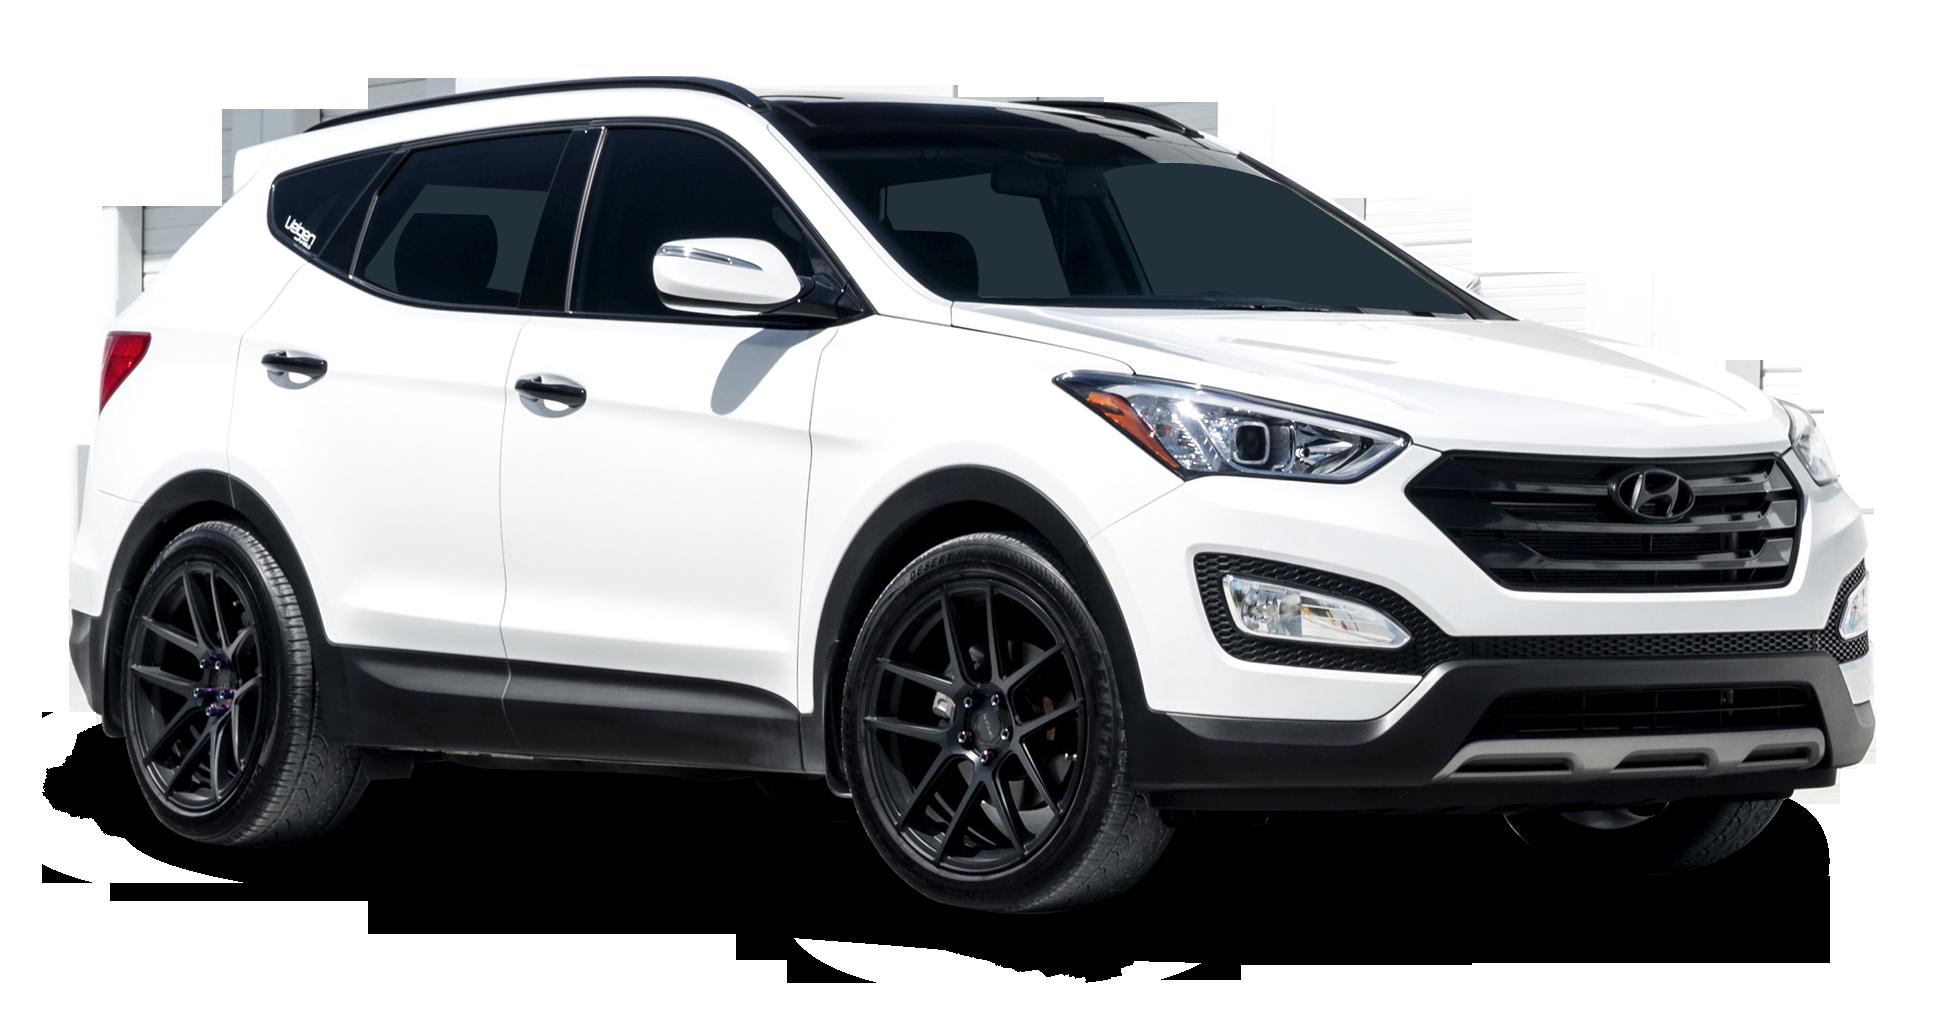 Hyundai Santa Fe White Car Png Image Purepng Free